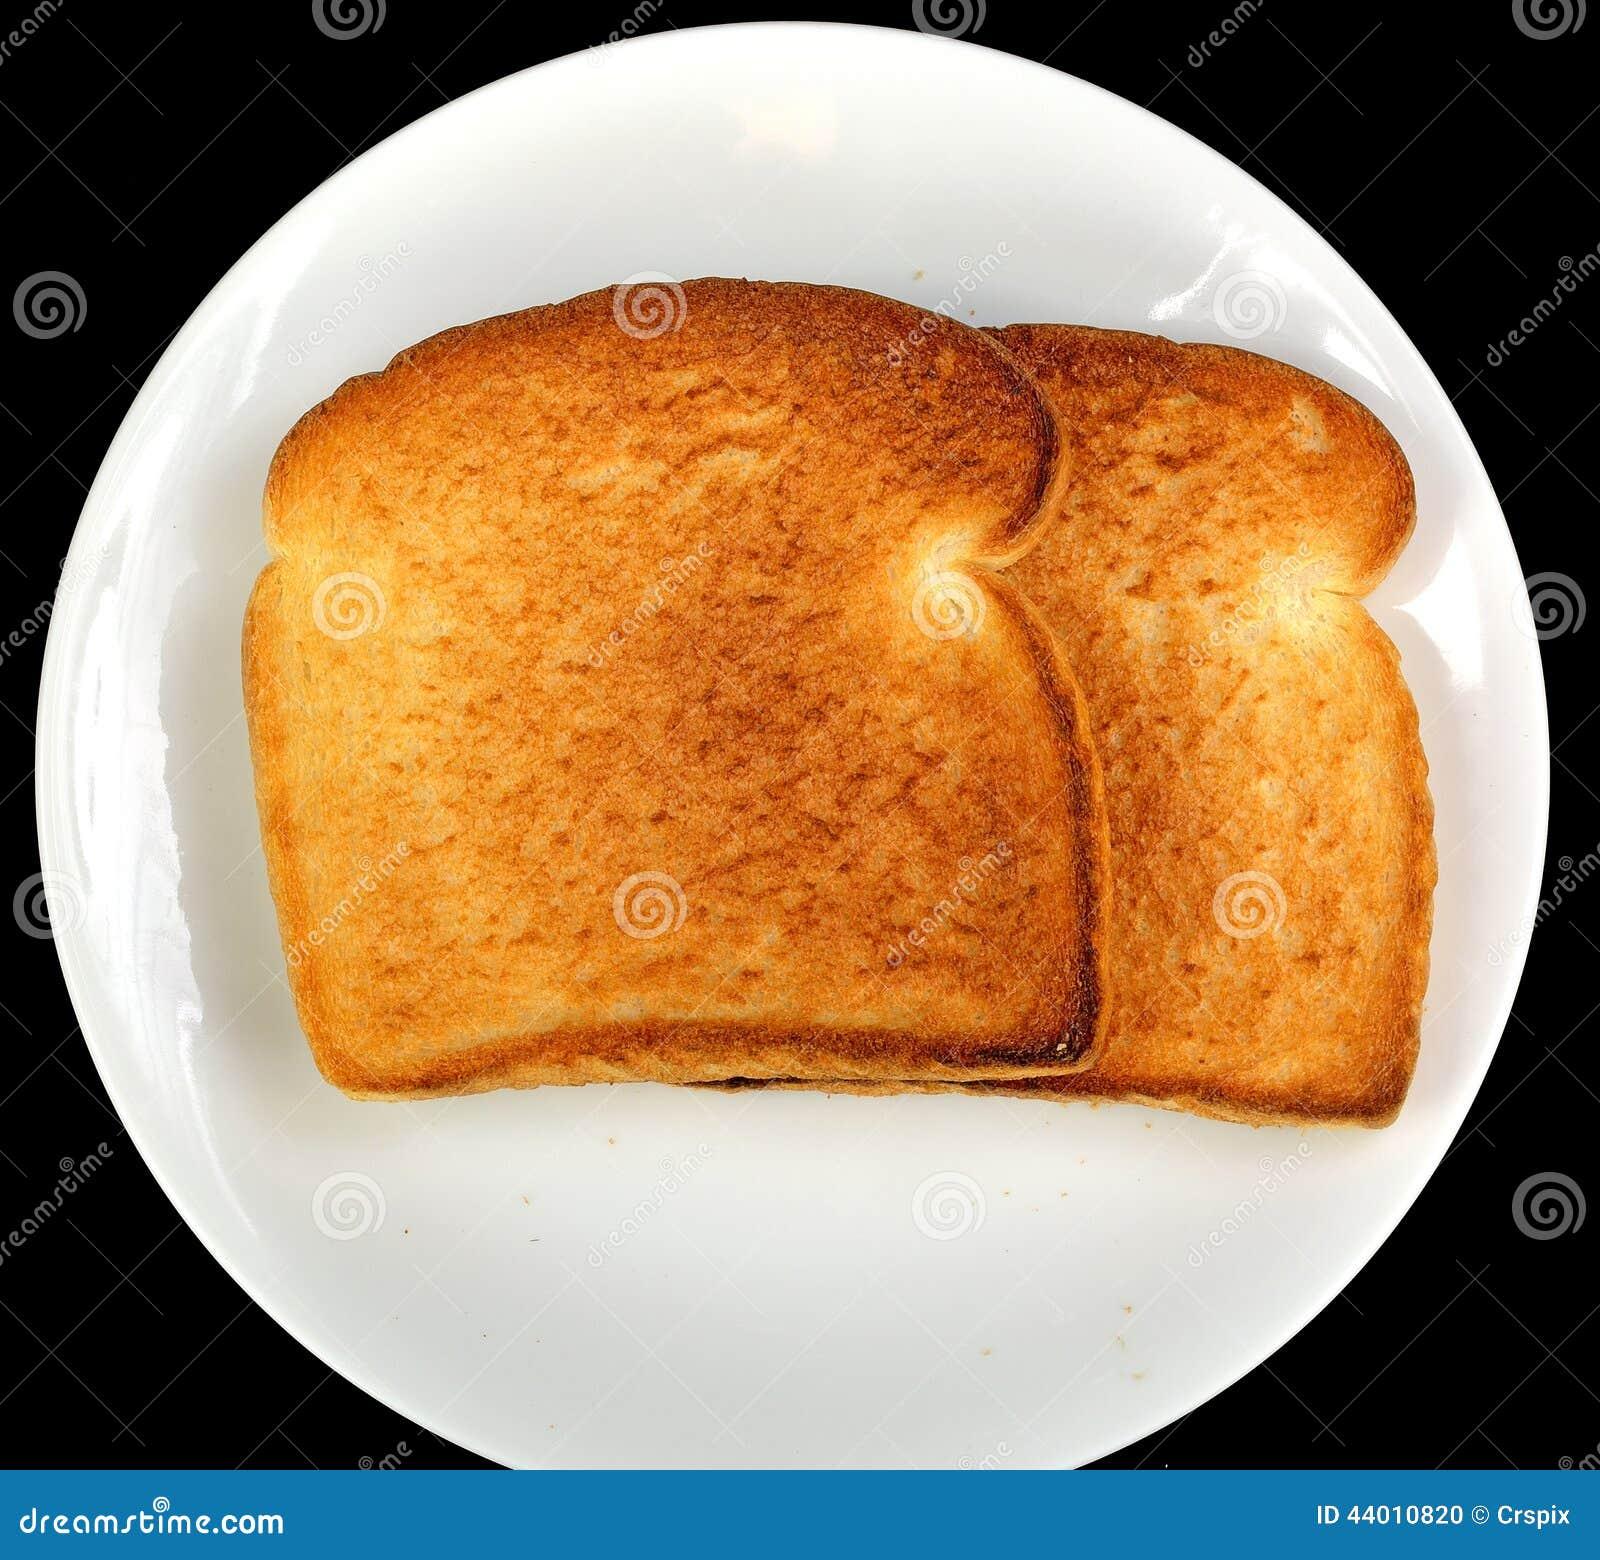 Toasted White Bread Stock Photo - Image: 44010820